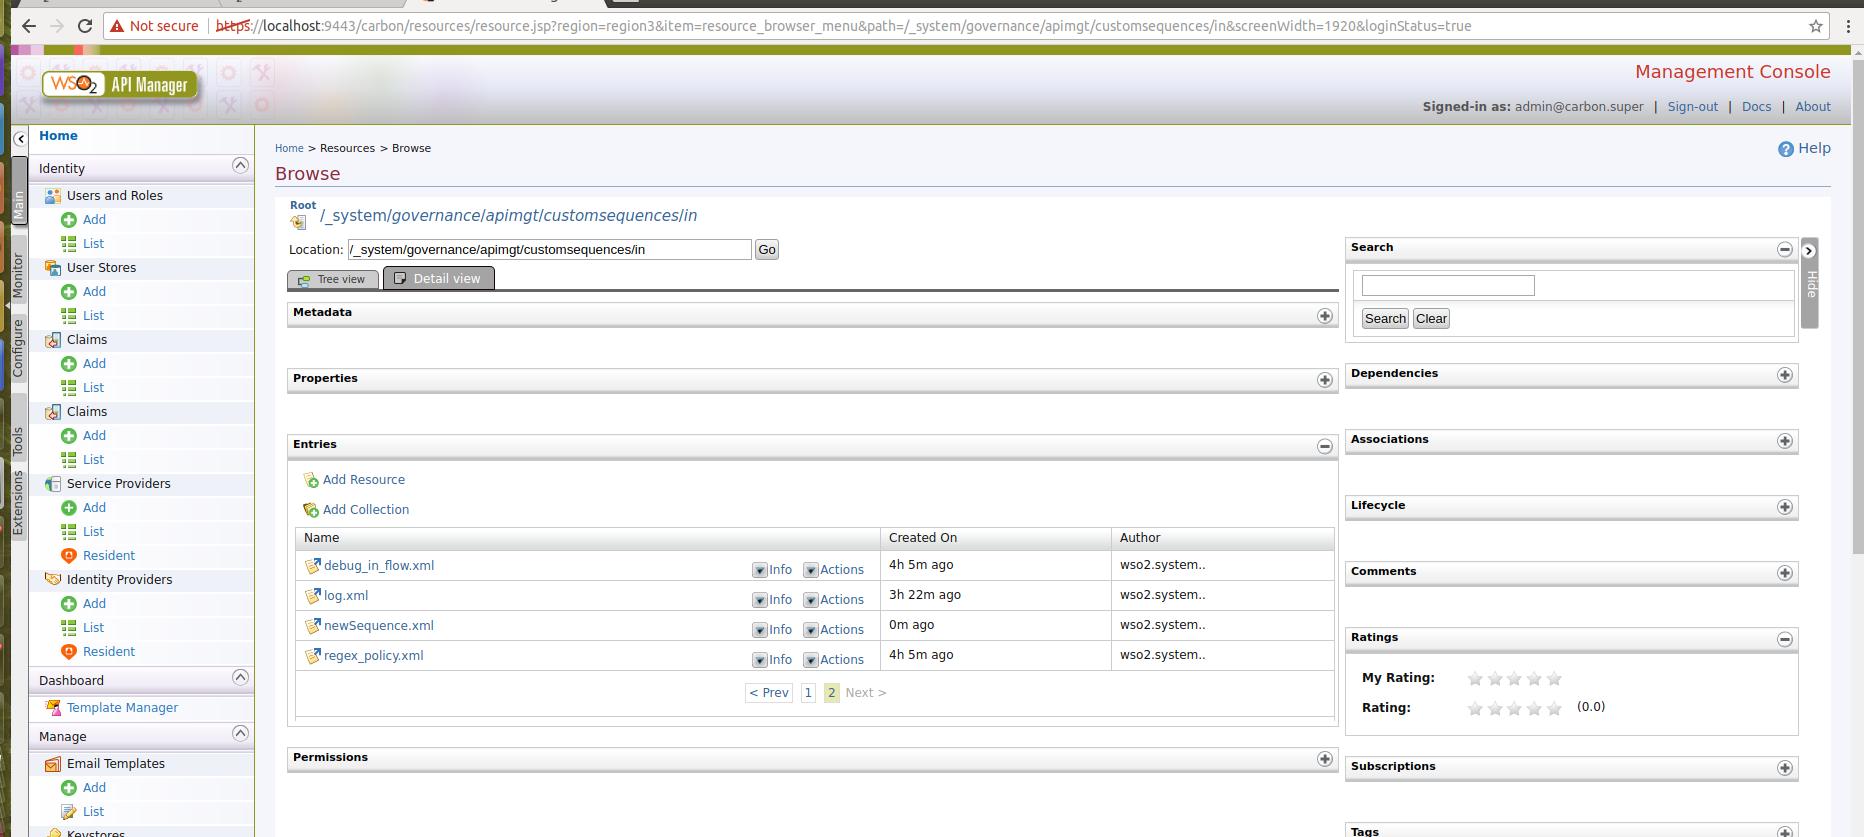 API Manager Management Console